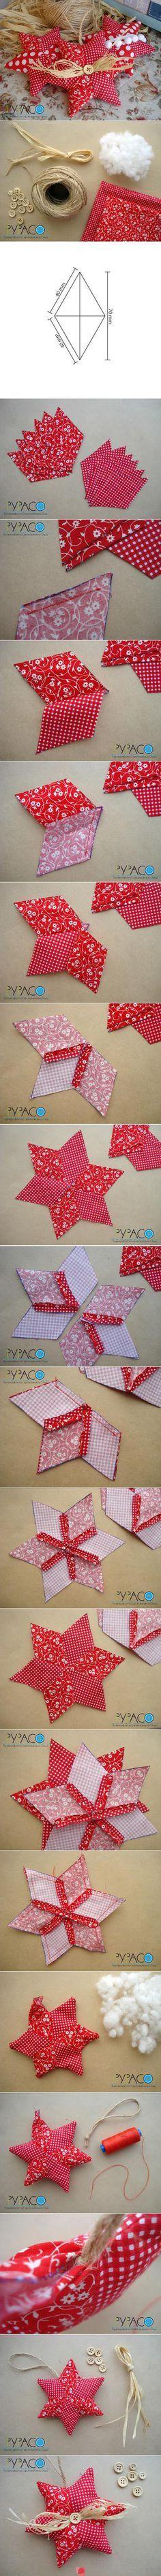 stitched star ornaments